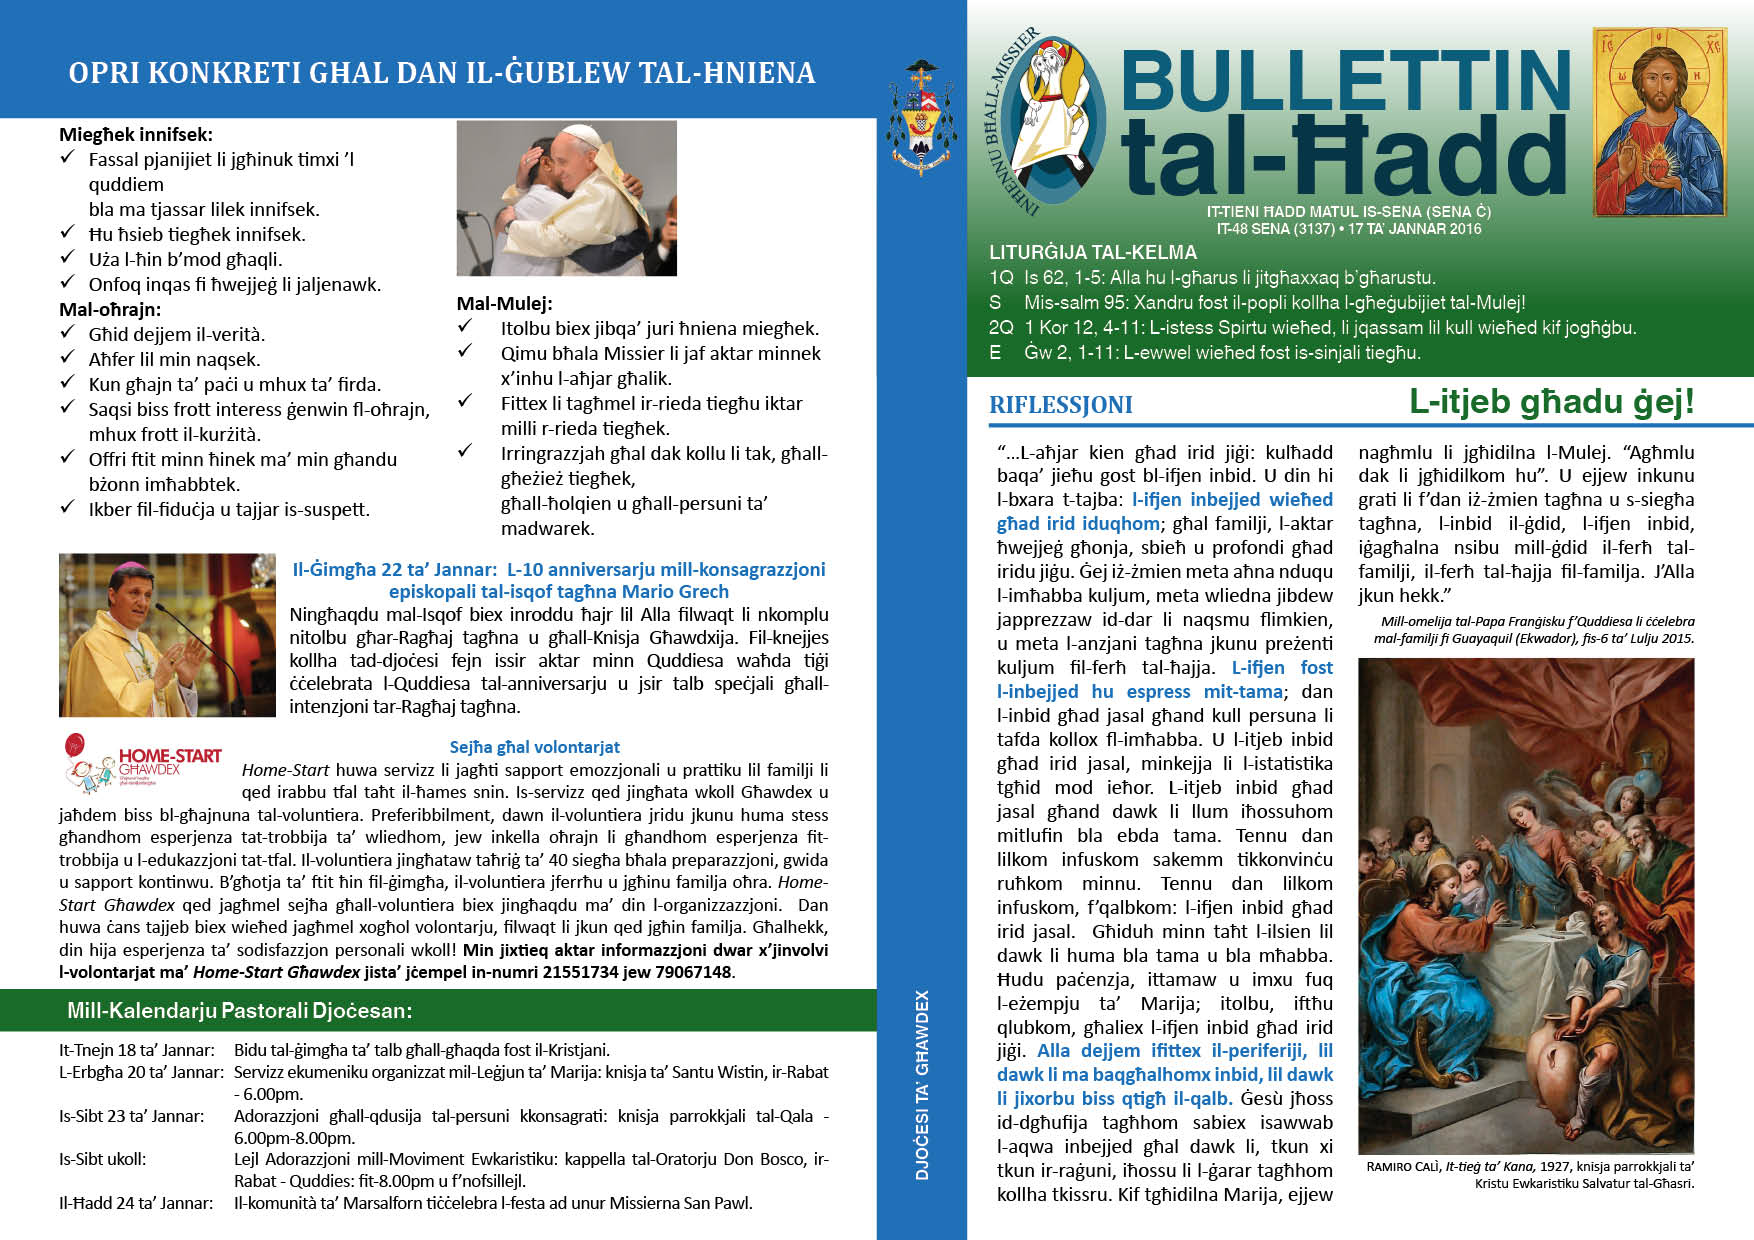 bullettin-2016-jannar-17.jpg